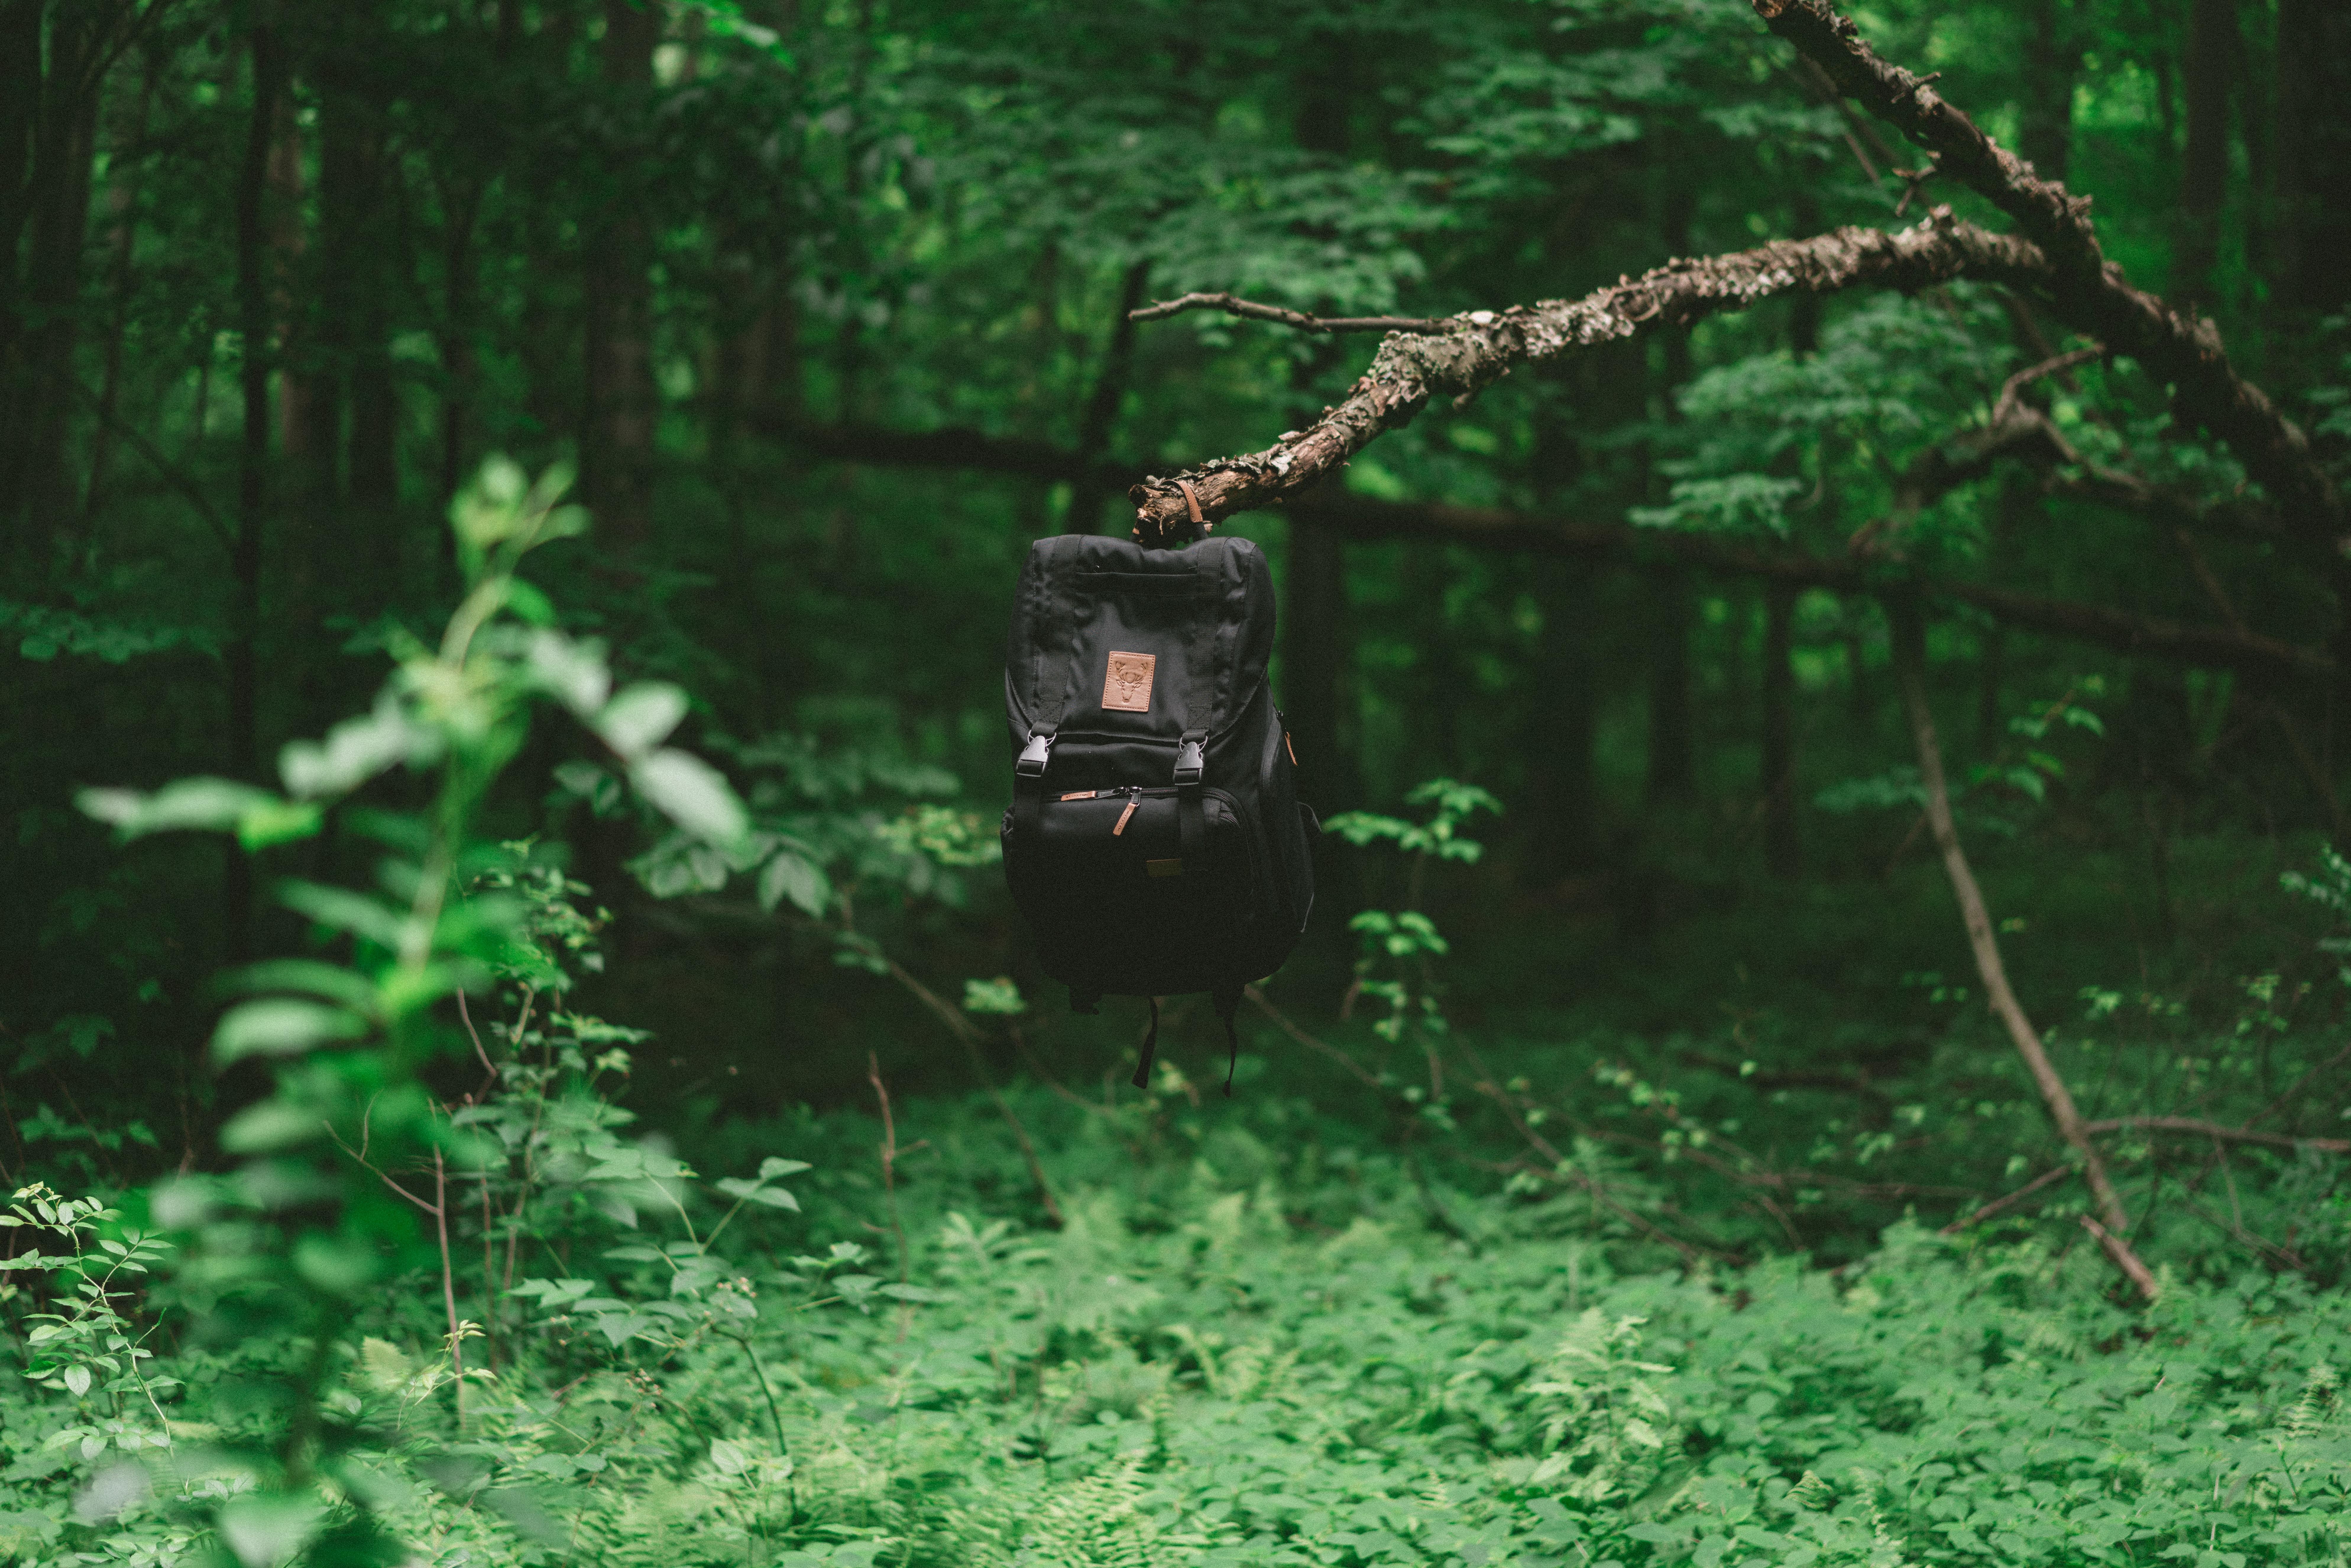 black knapsack on tree branch